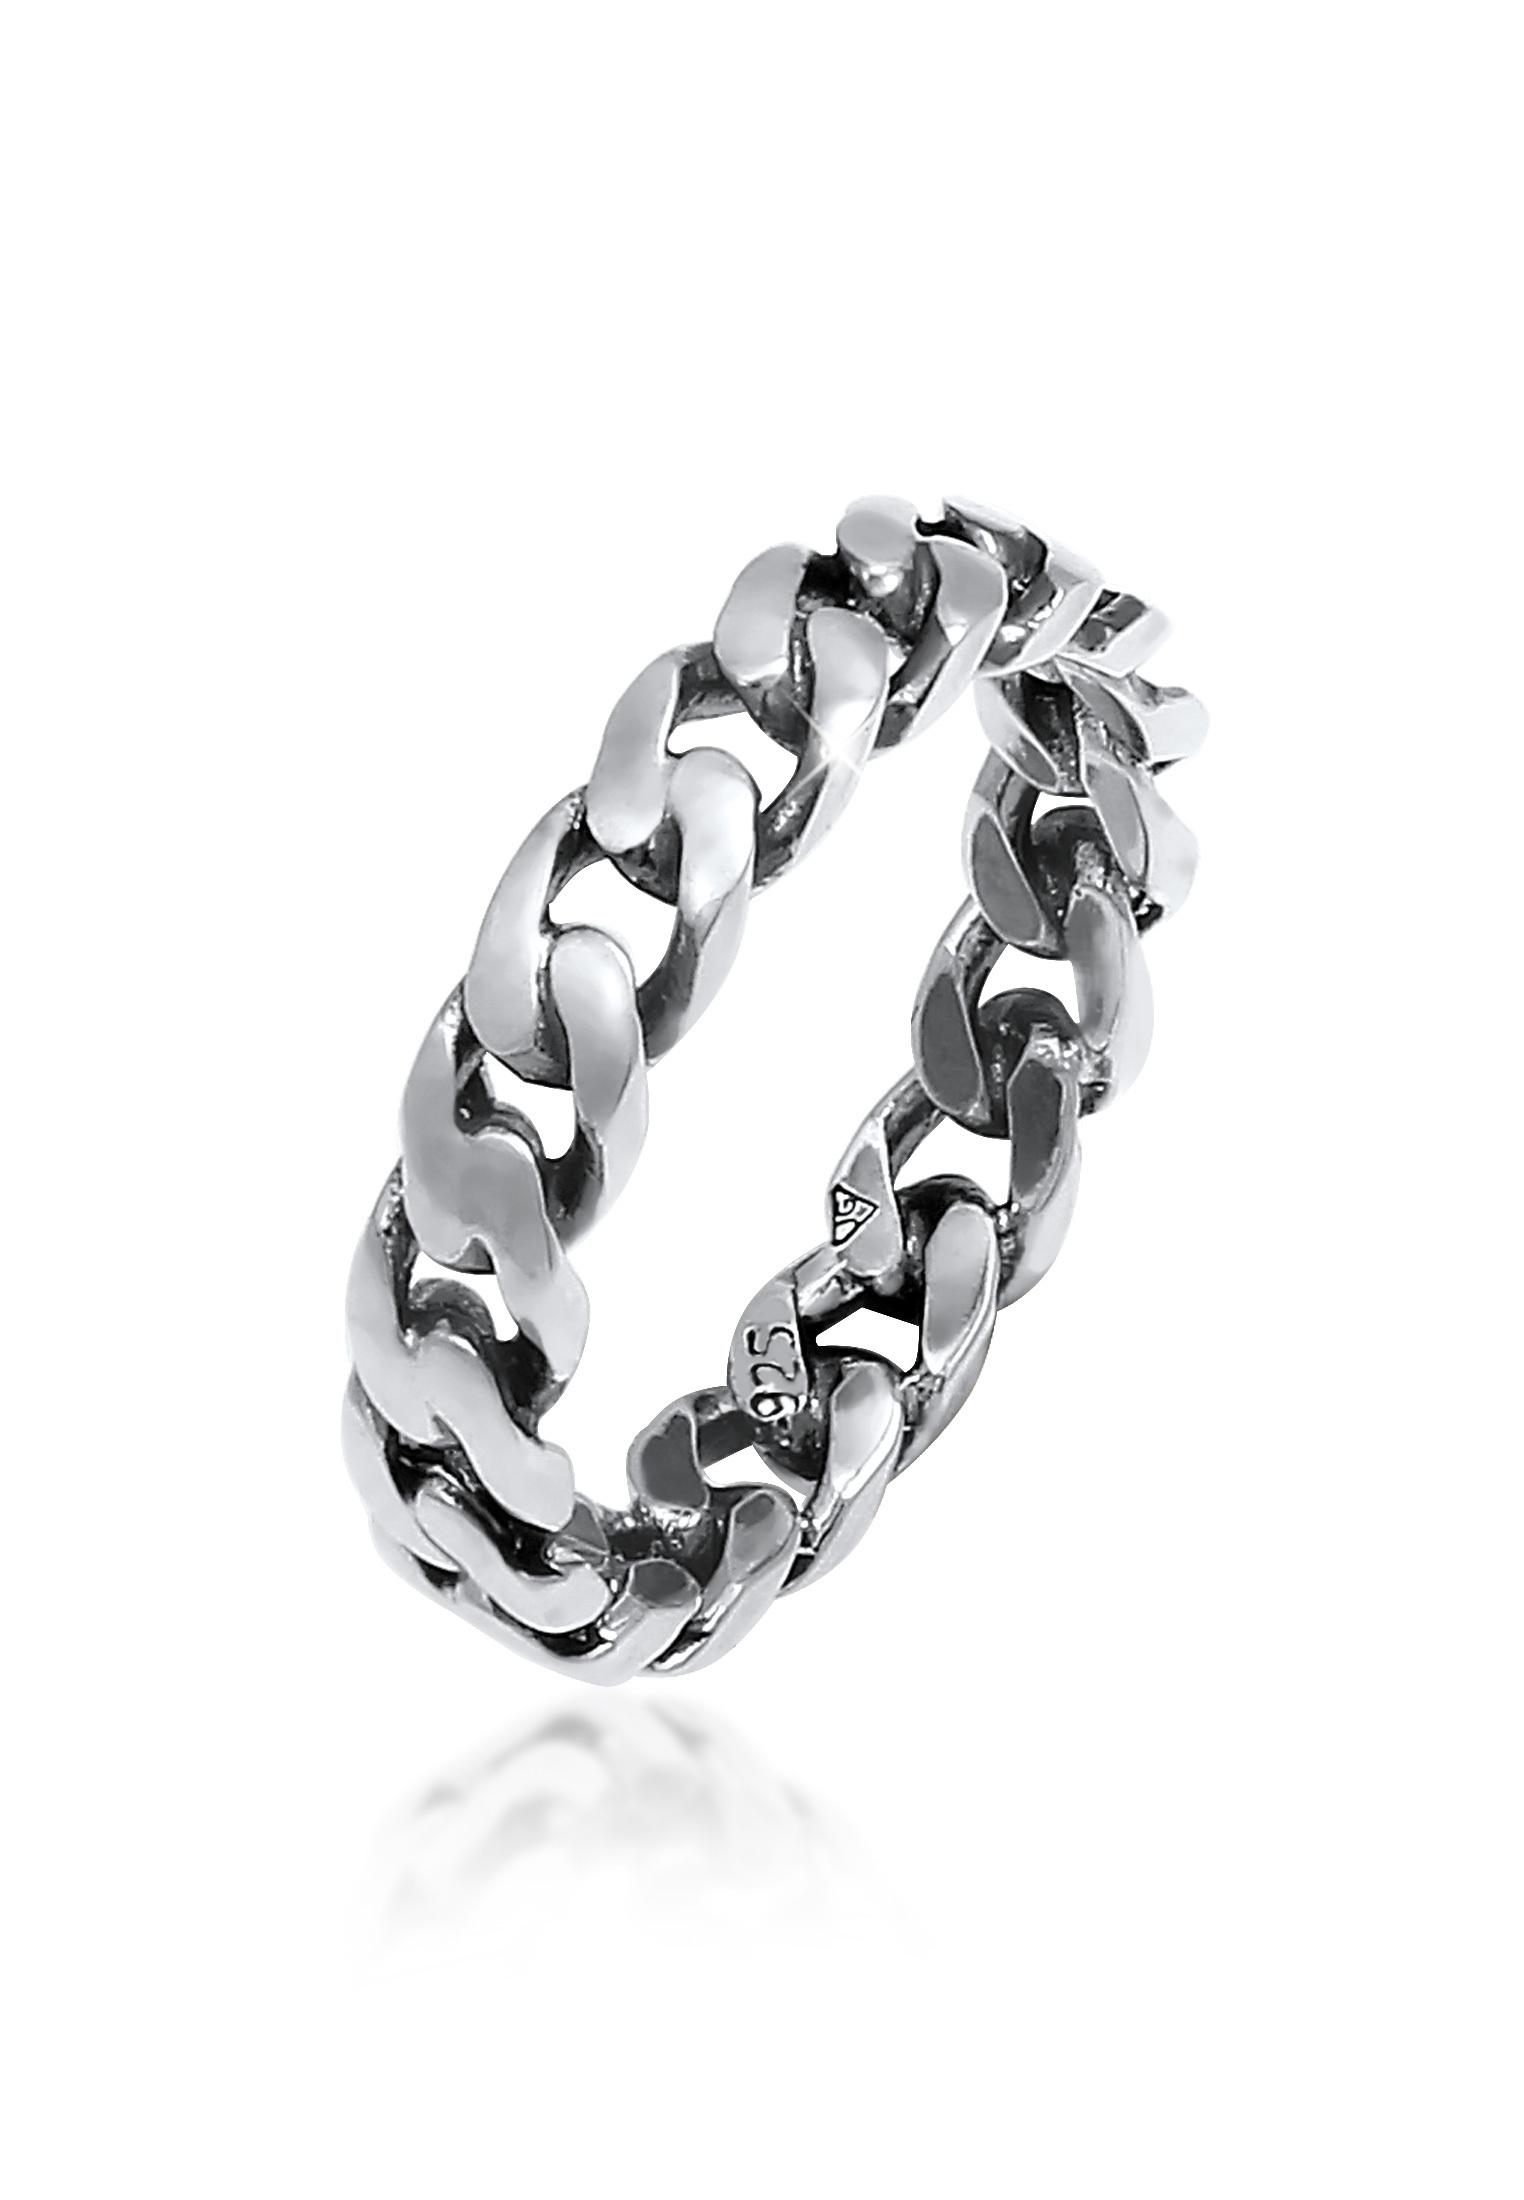 Ring Twisted | 925er Sterling Silber